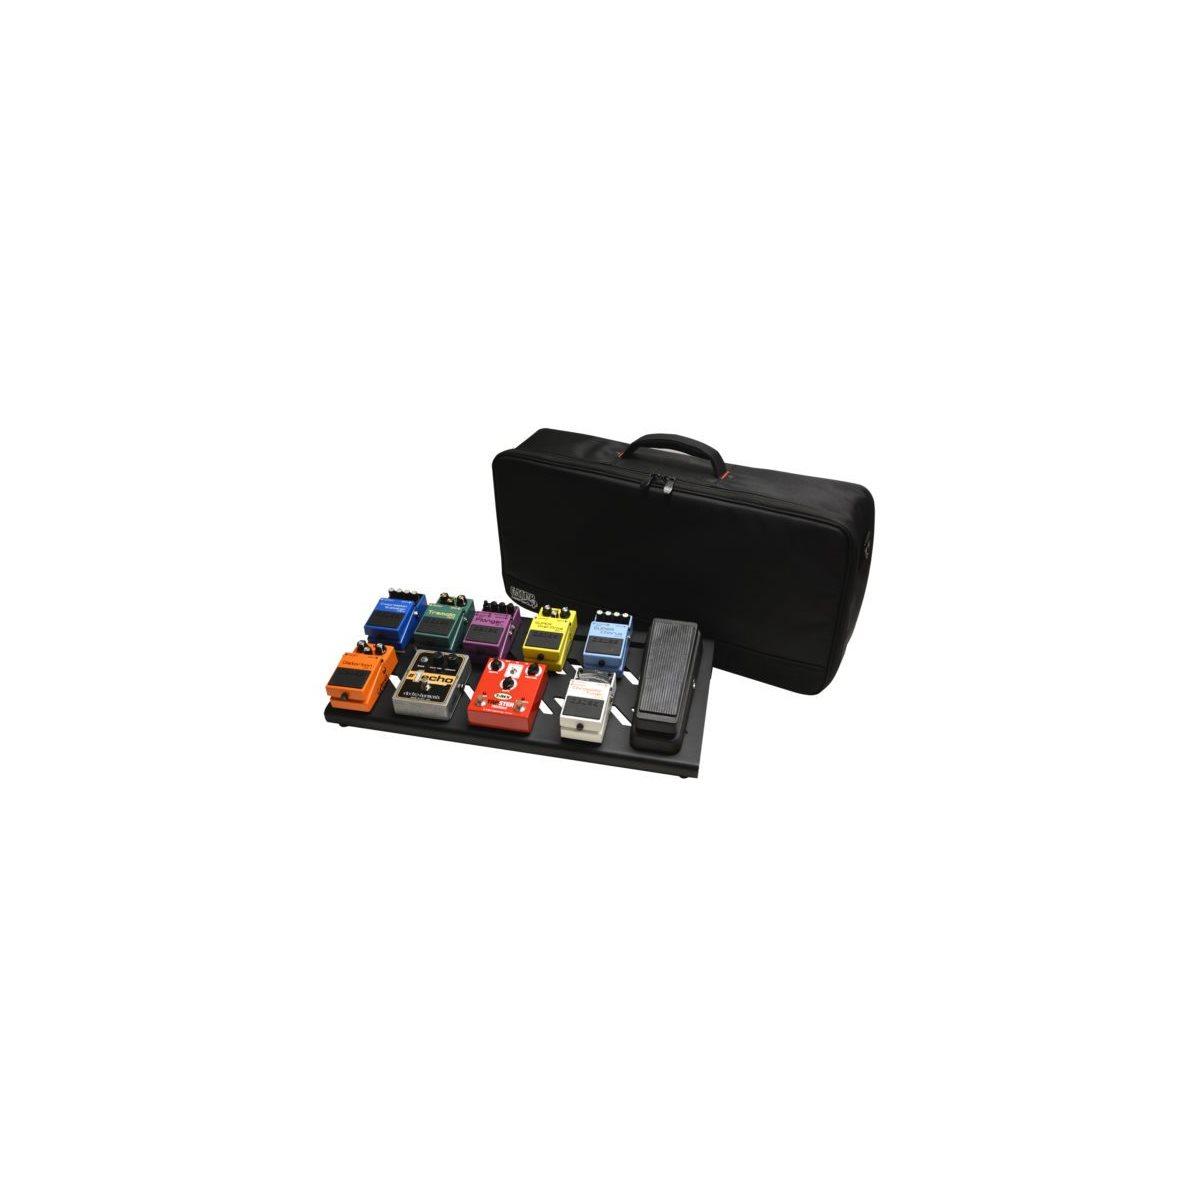 GATOR - GPB-BAK-1 - Large Pedal Board W / Carry Bag